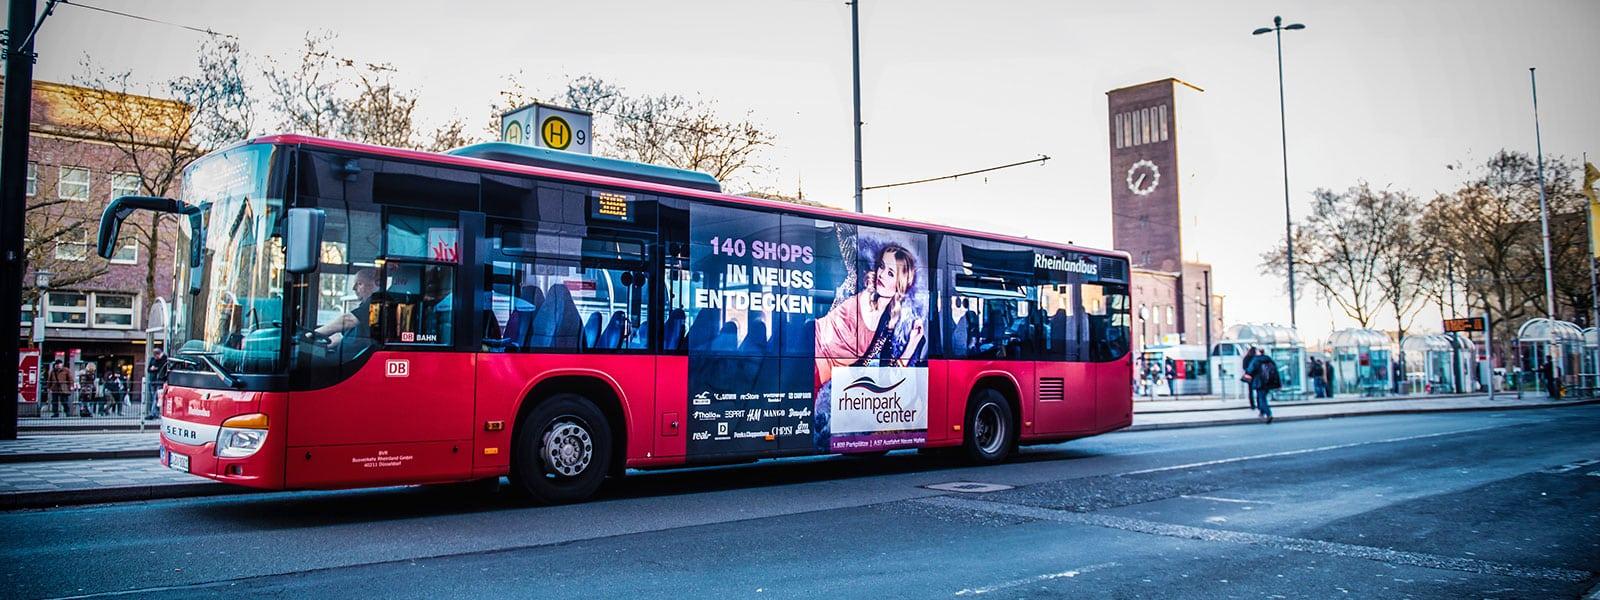 Bremen-Verkehrsmittelwerbung-Bus-Traffic-Board